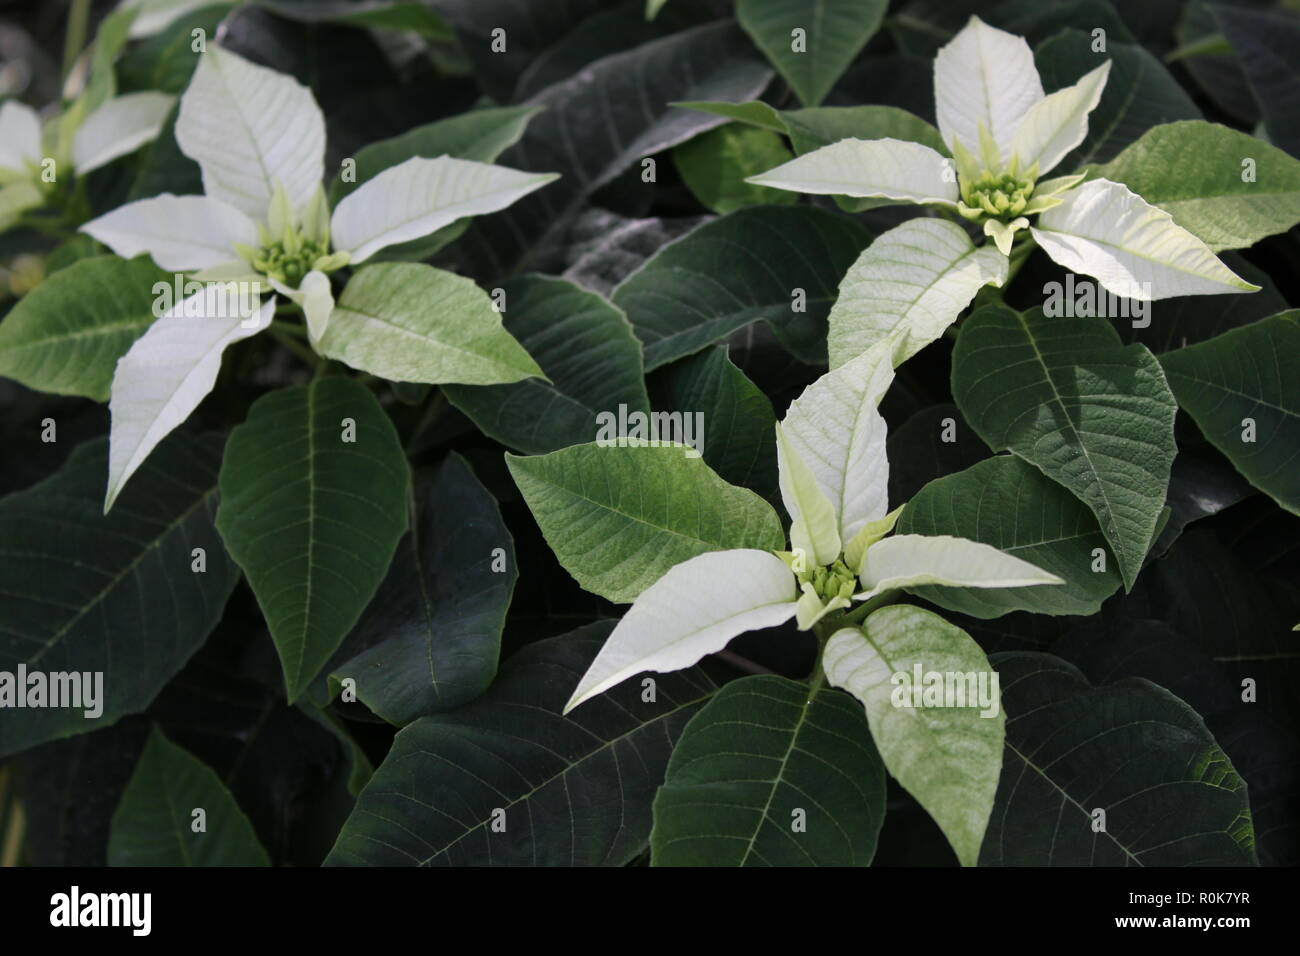 Etoile De Noel Plante Exterieur euphorbia pulcherrima photos & euphorbia pulcherrima images